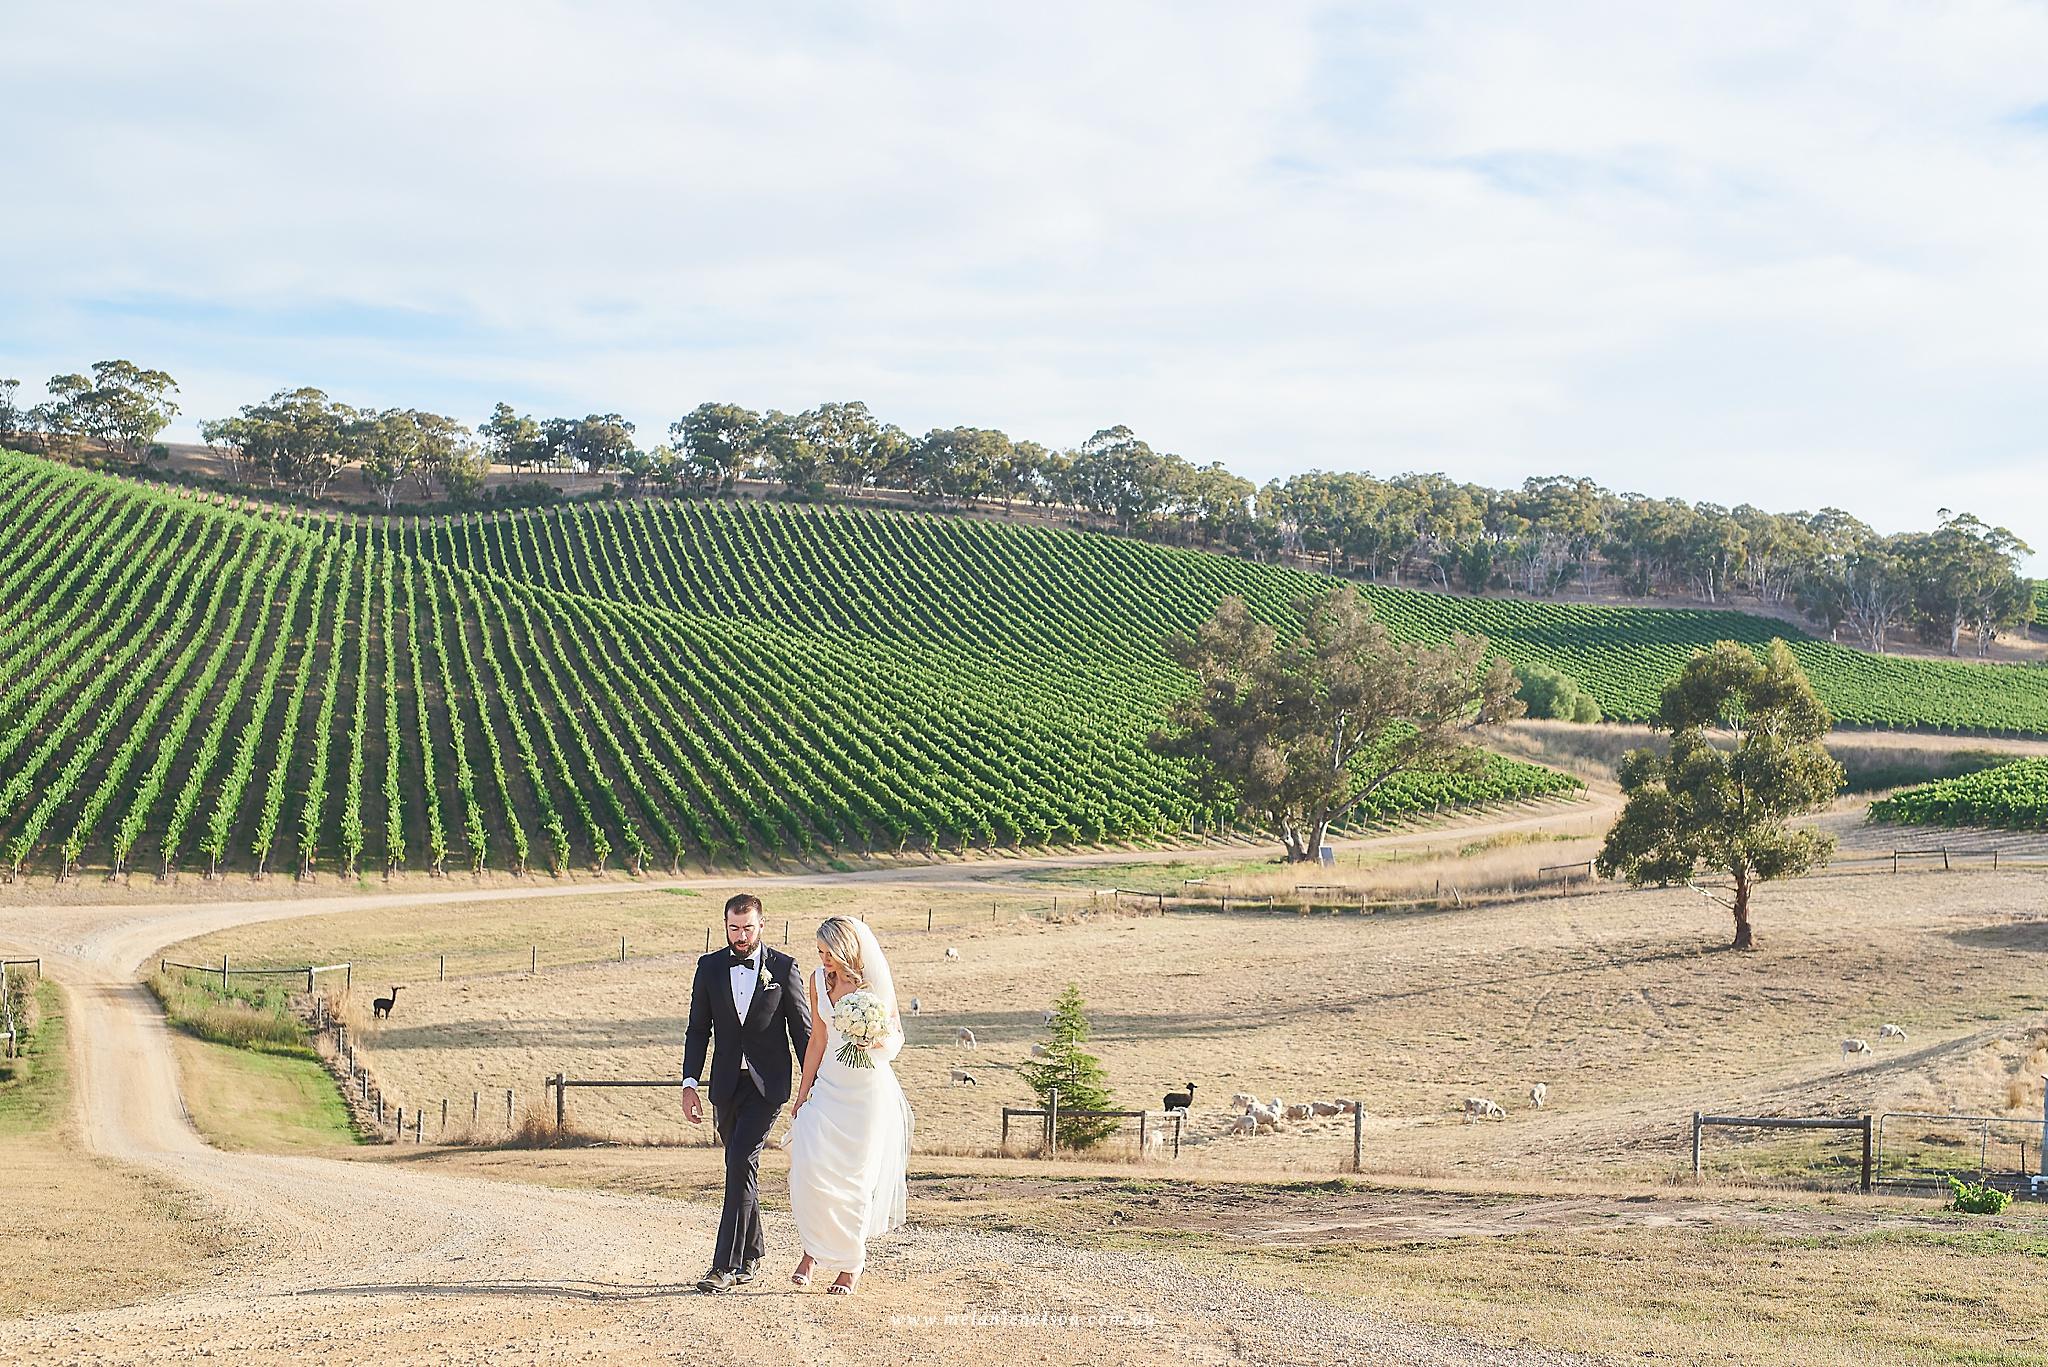 longview_vineyard_wedding_0059.jpg